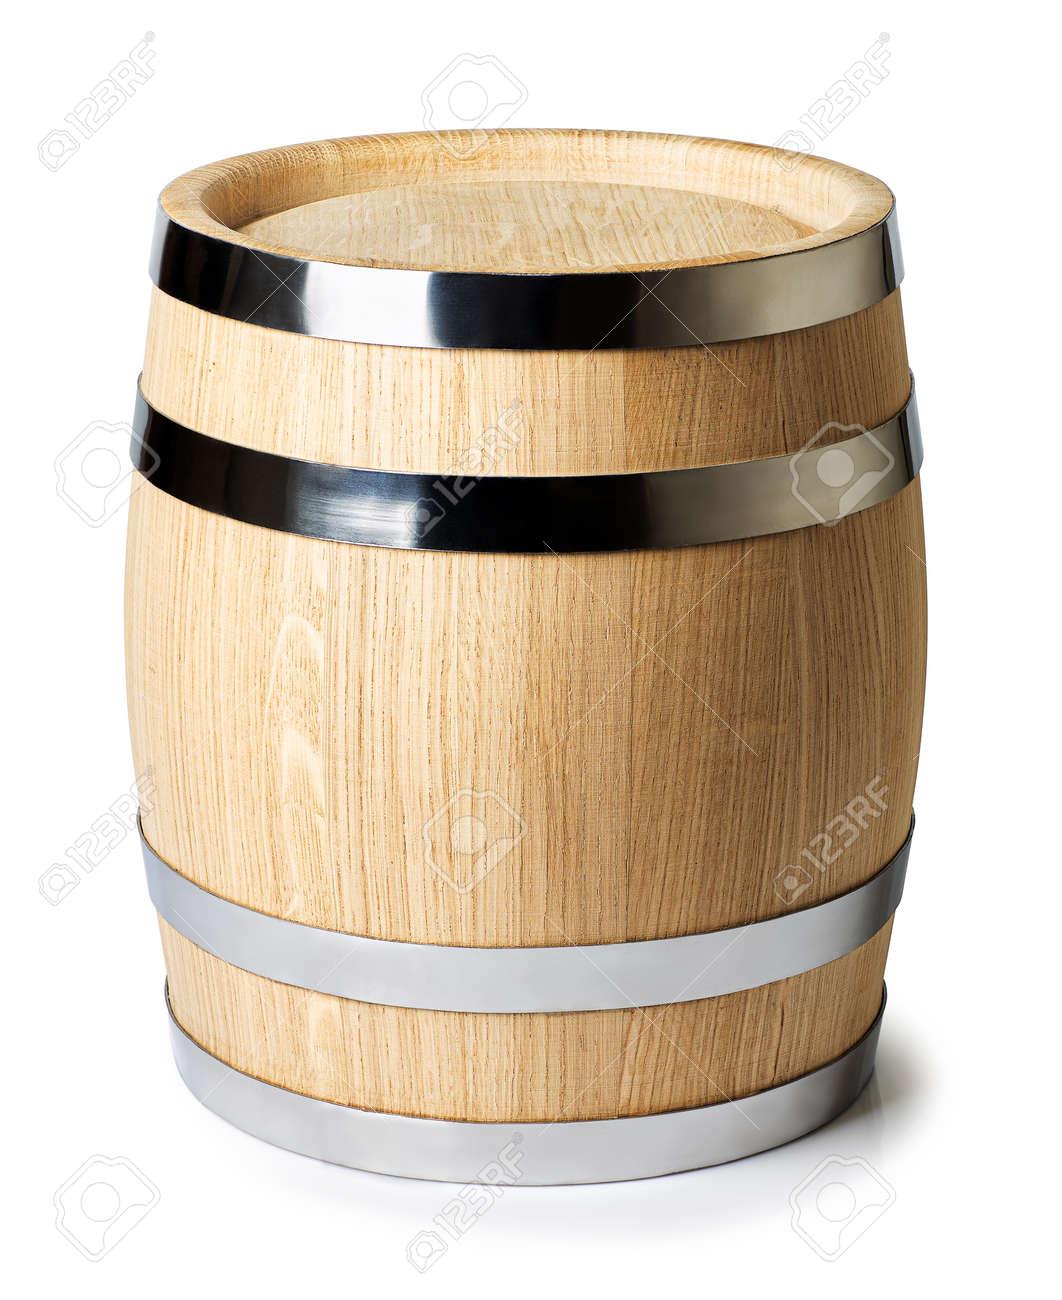 wine barrel isolated - 139394059